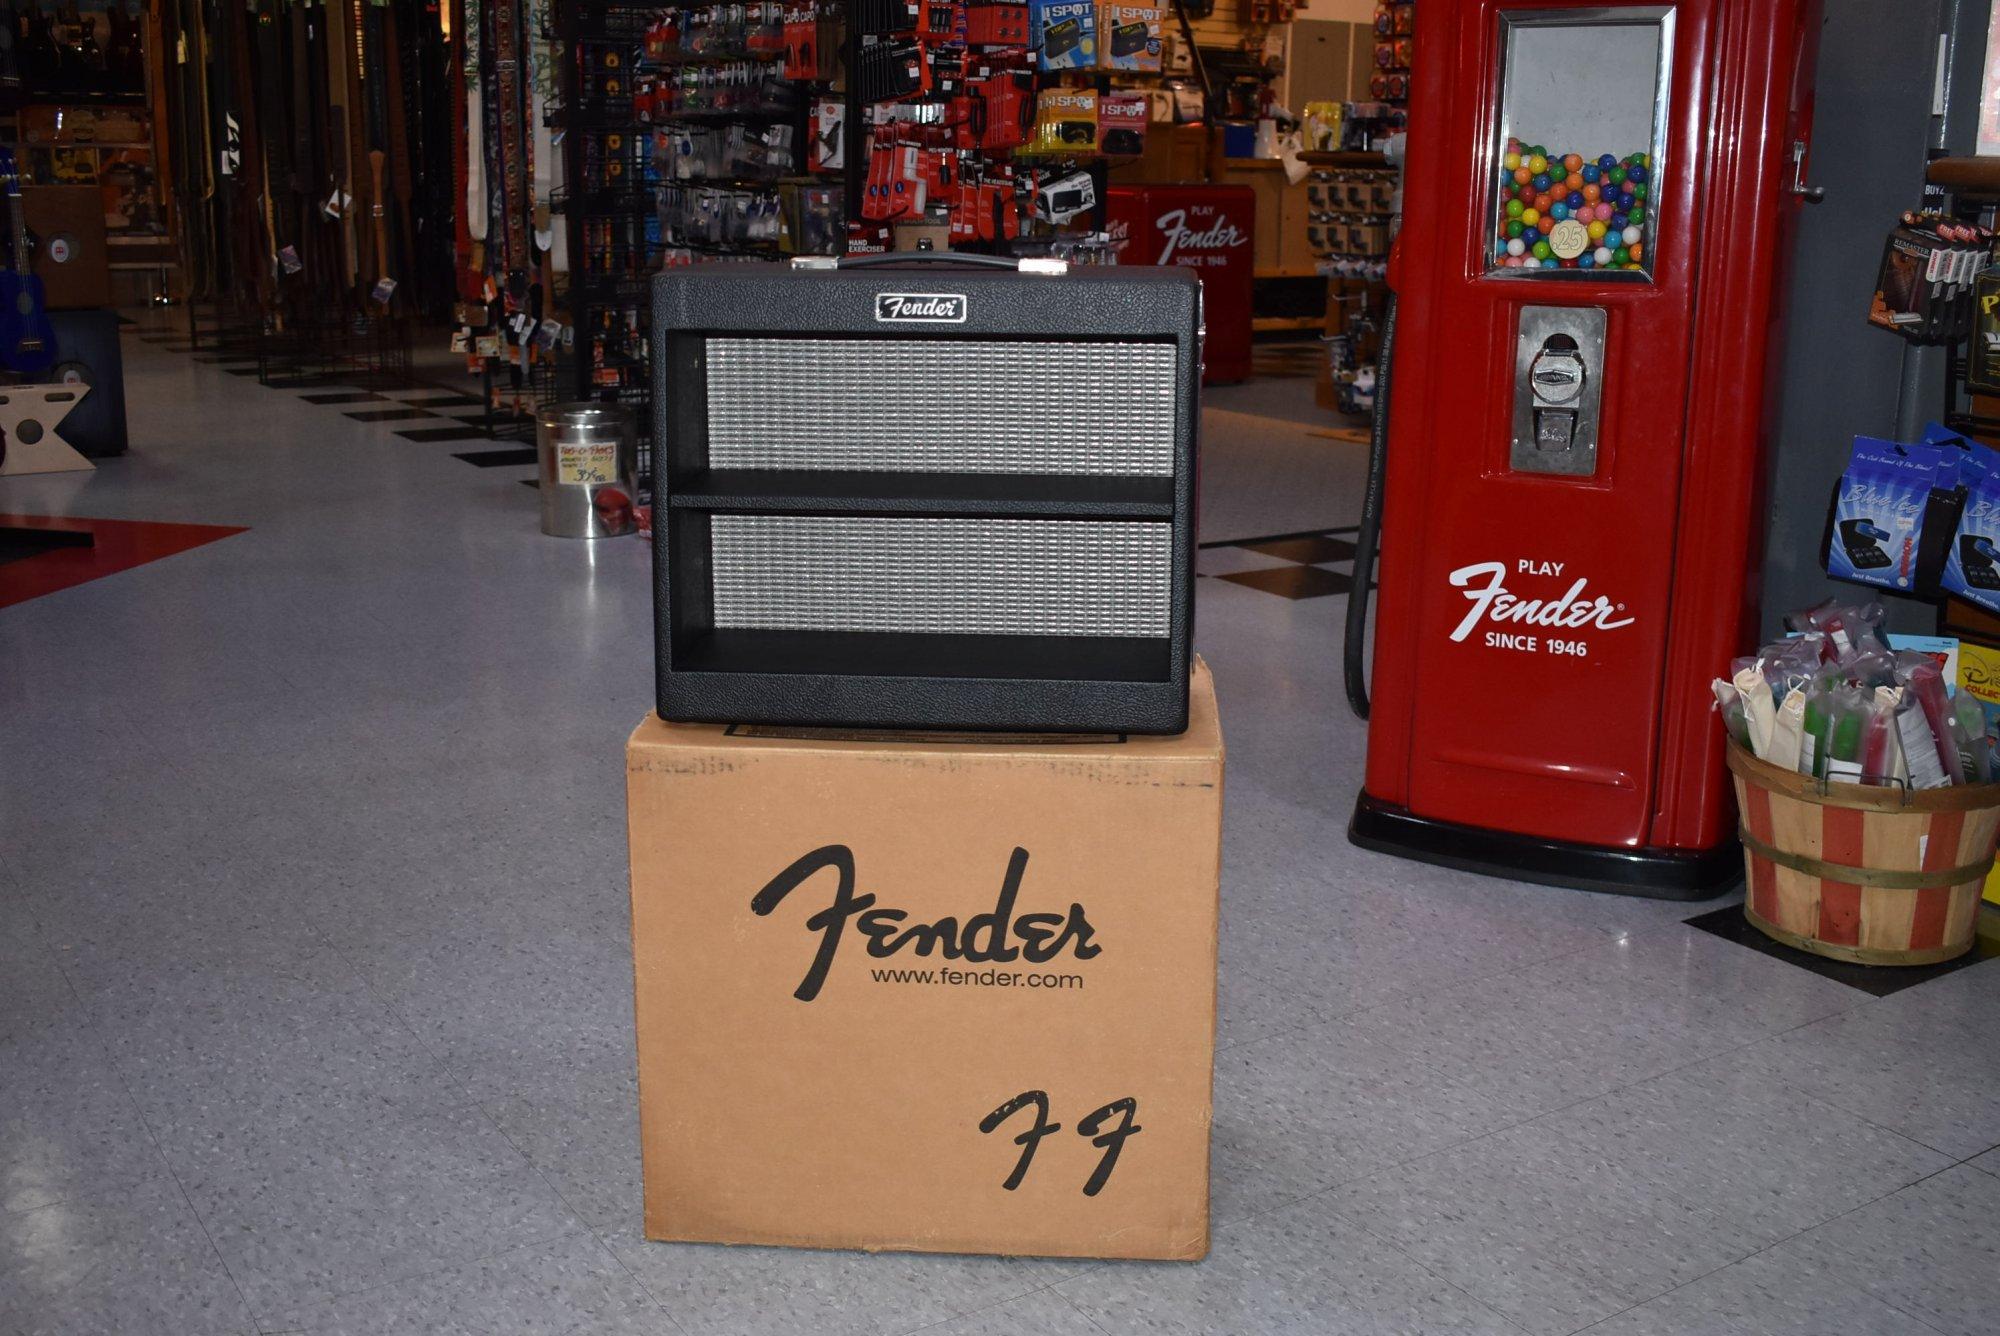 Fender Amp Display Cabinet Promo